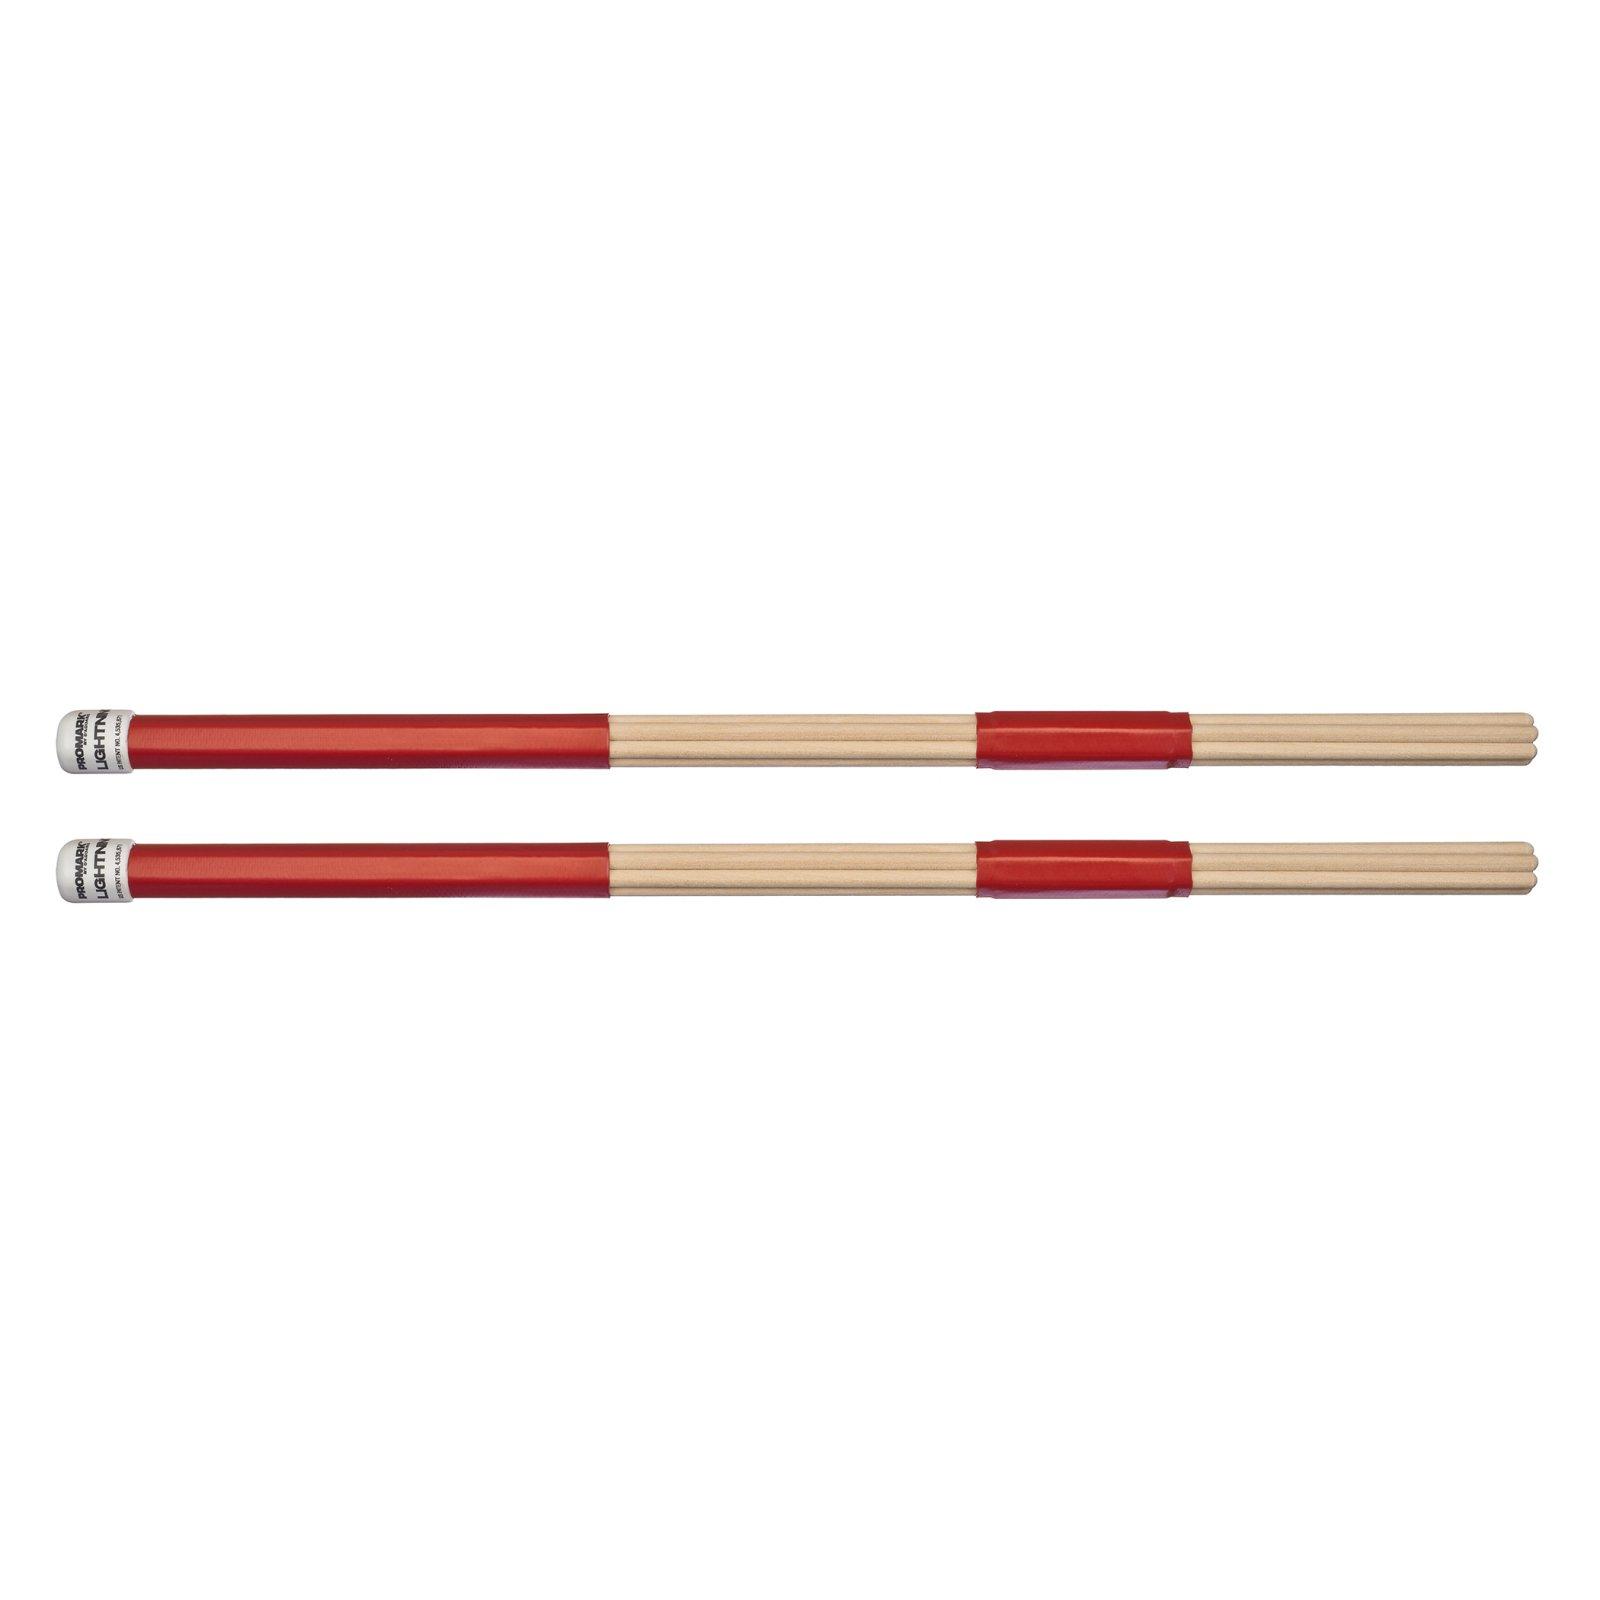 Promark L-RODS Lightning Rods Specialty Drumsticks